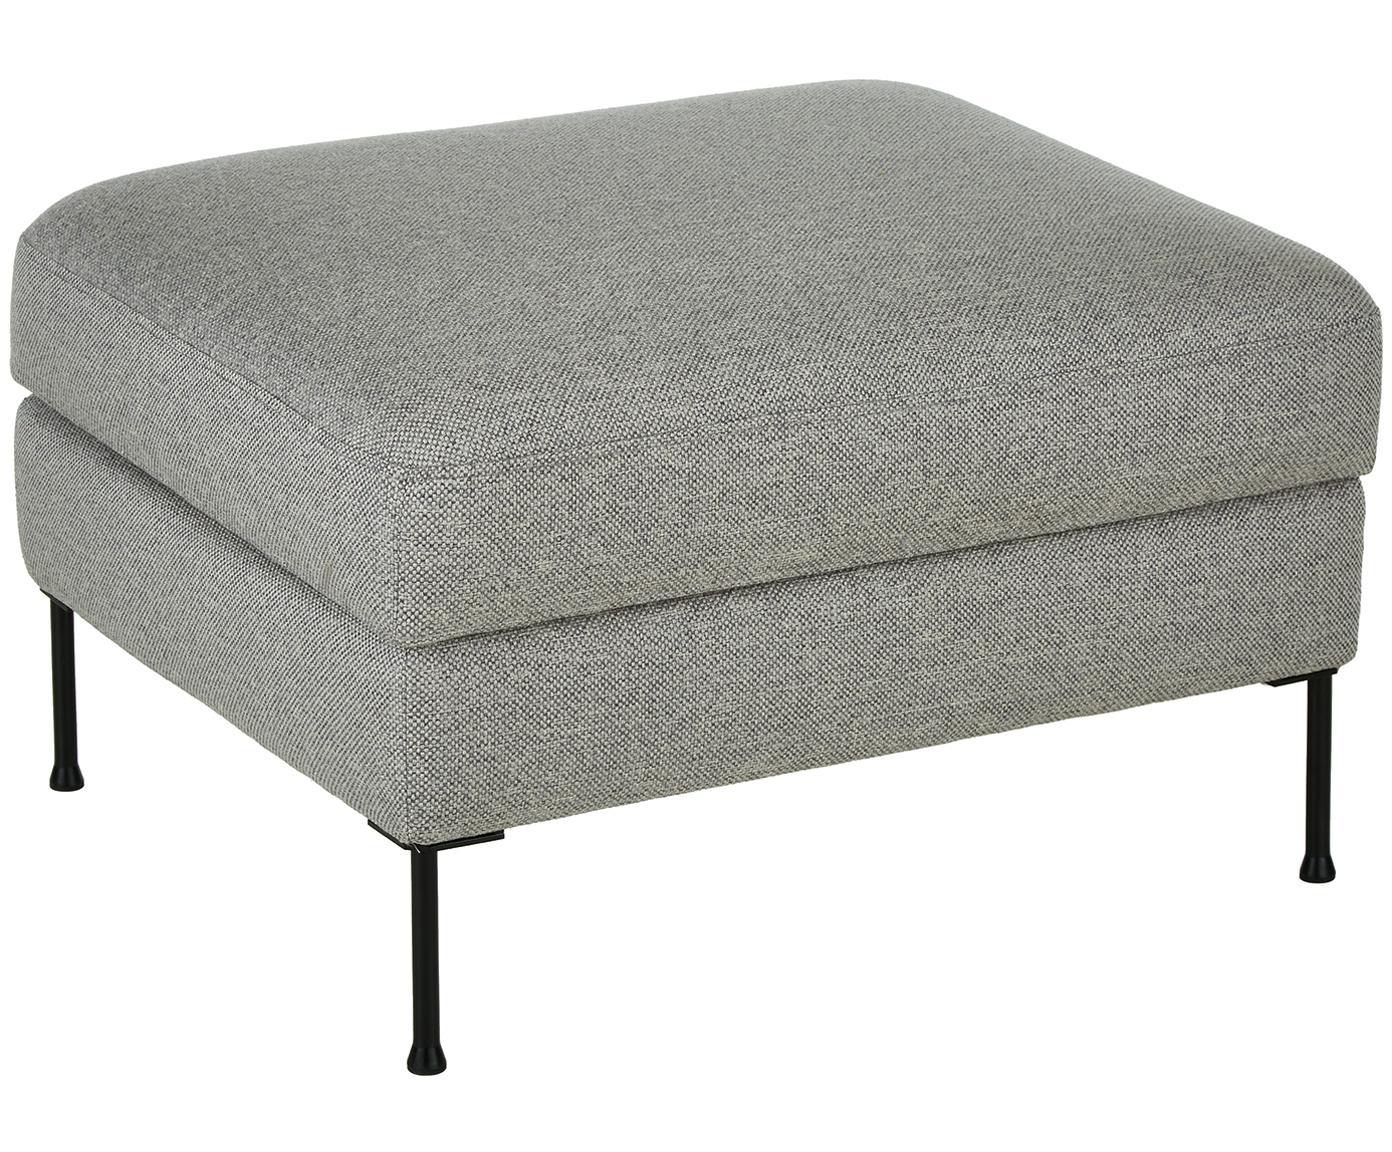 Sofa-Hocker Cucita mit Stauraum, Bezug: Webstoff (Polyester) 45.0, Gestell: Massives Kiefernholz, Füße: Metall, lackiert, Hellgrau, 85 x 42 cm